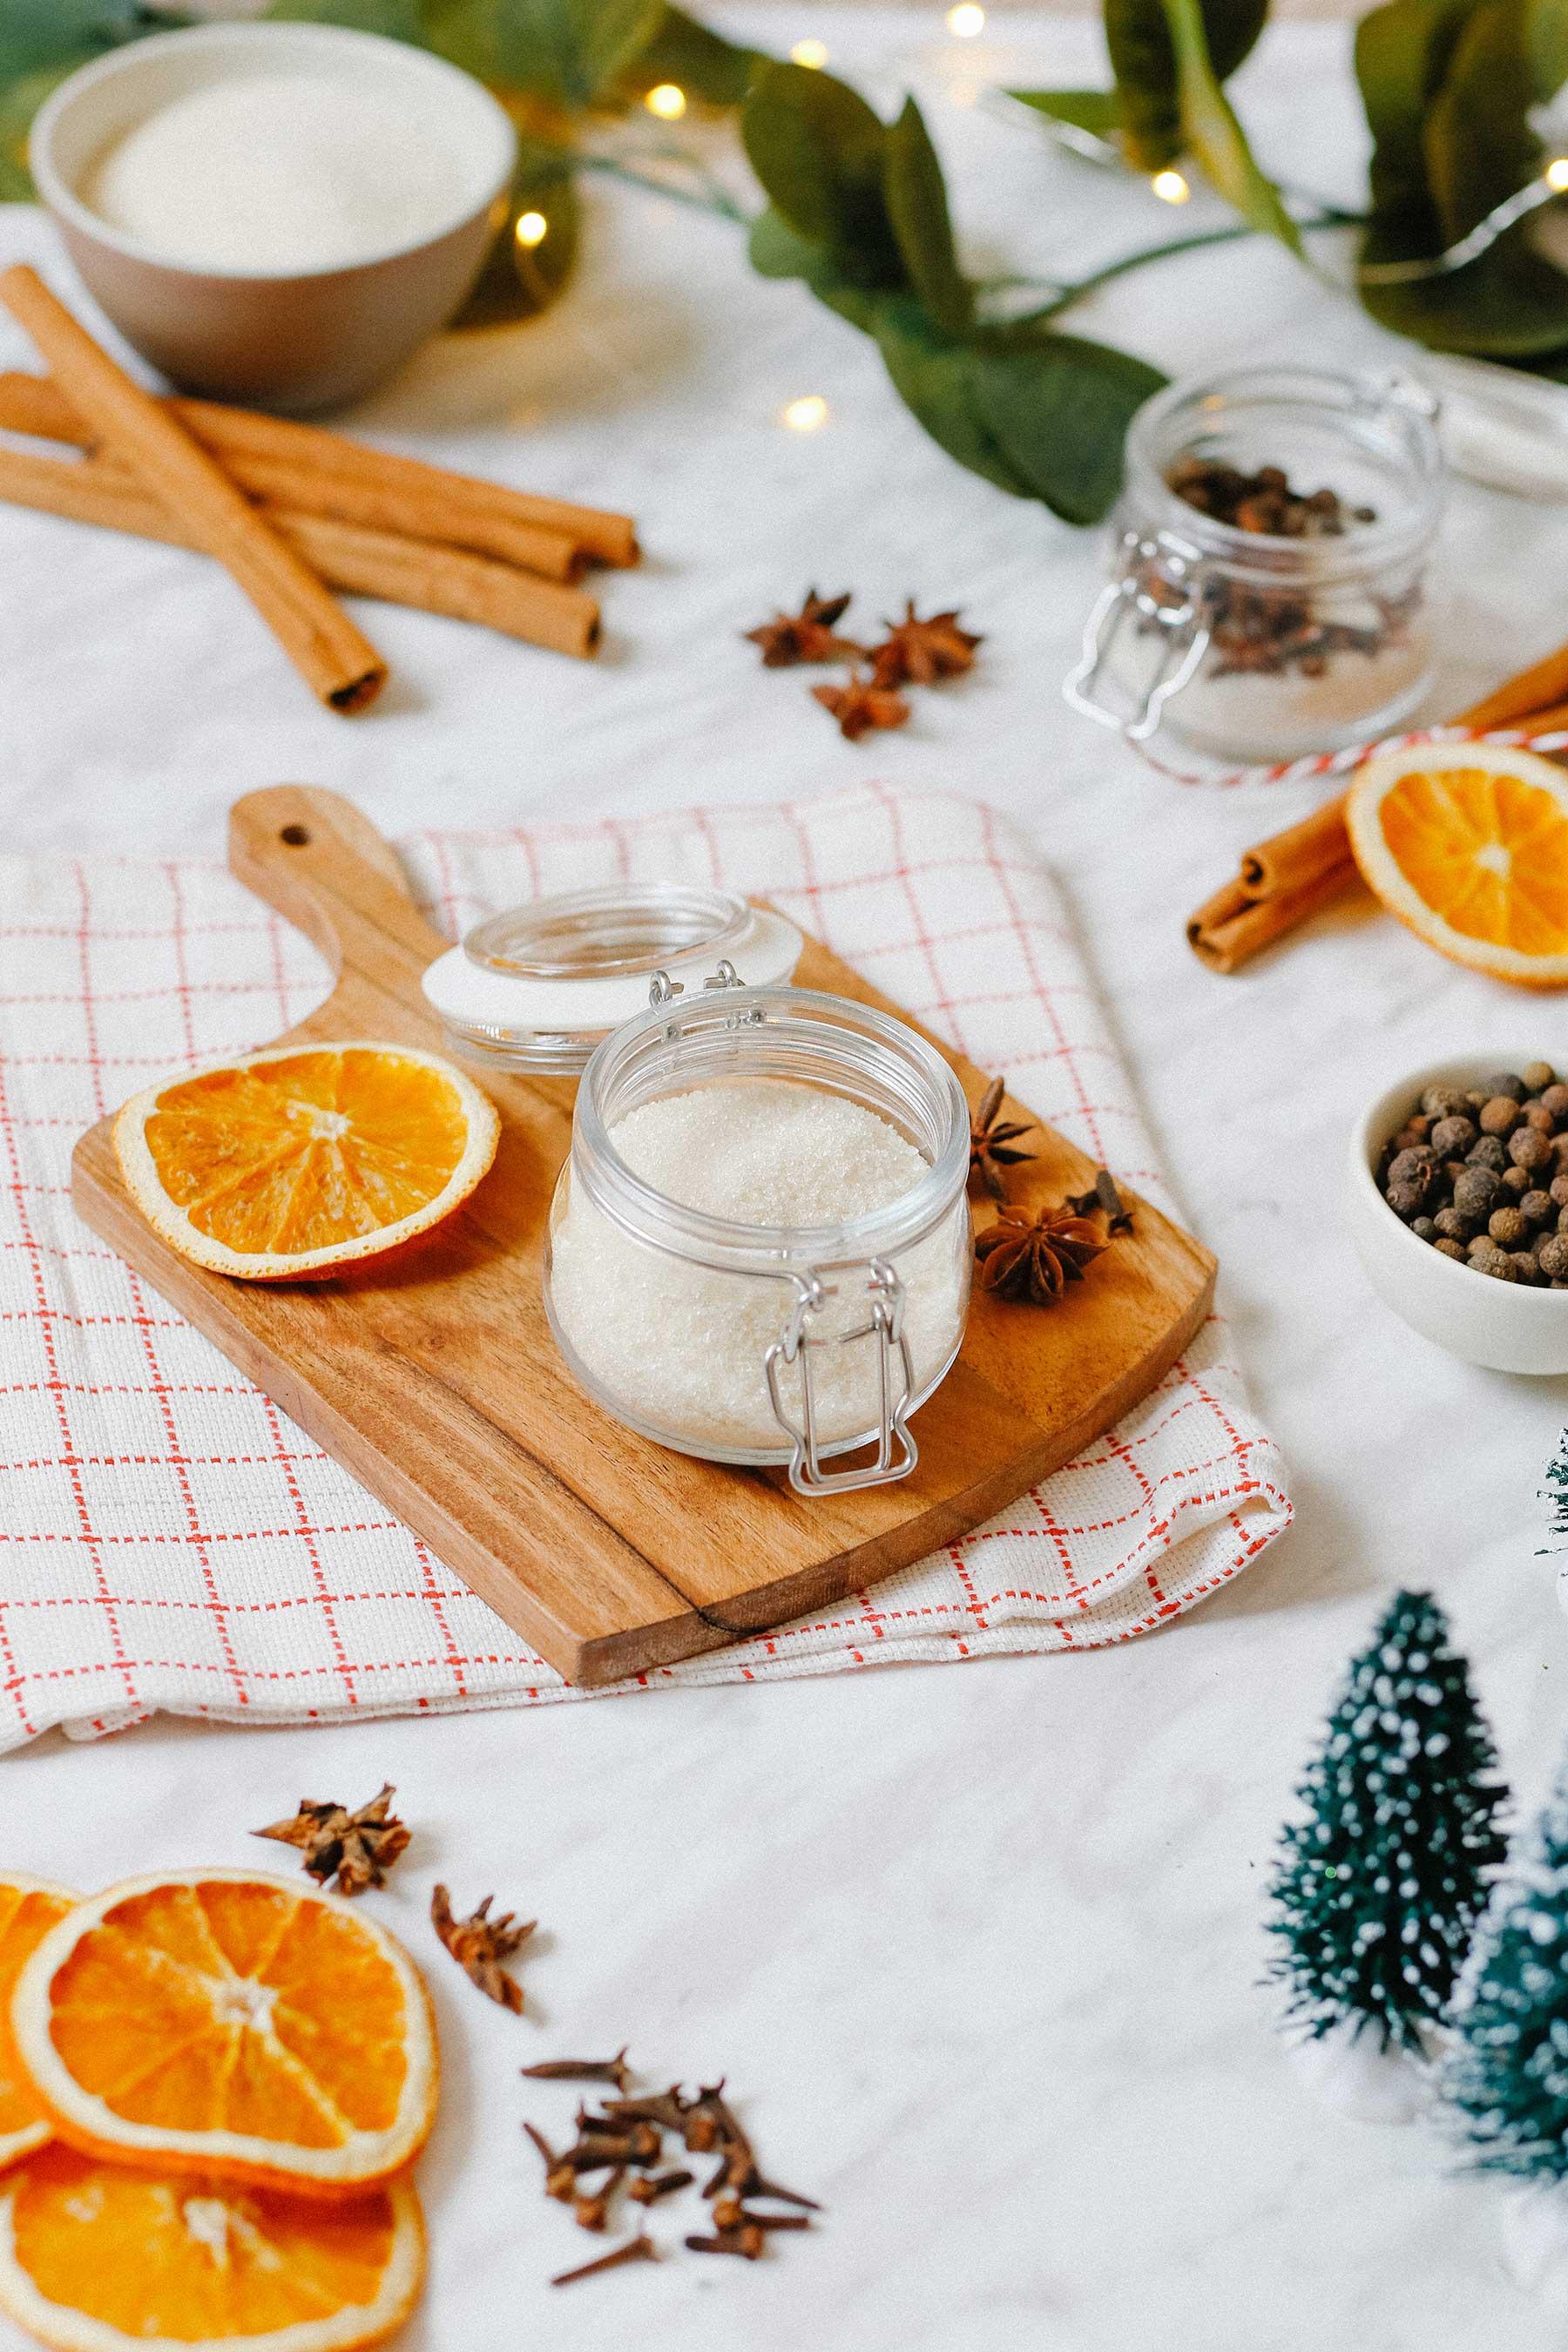 DIY Mulled WIne Spice Jar